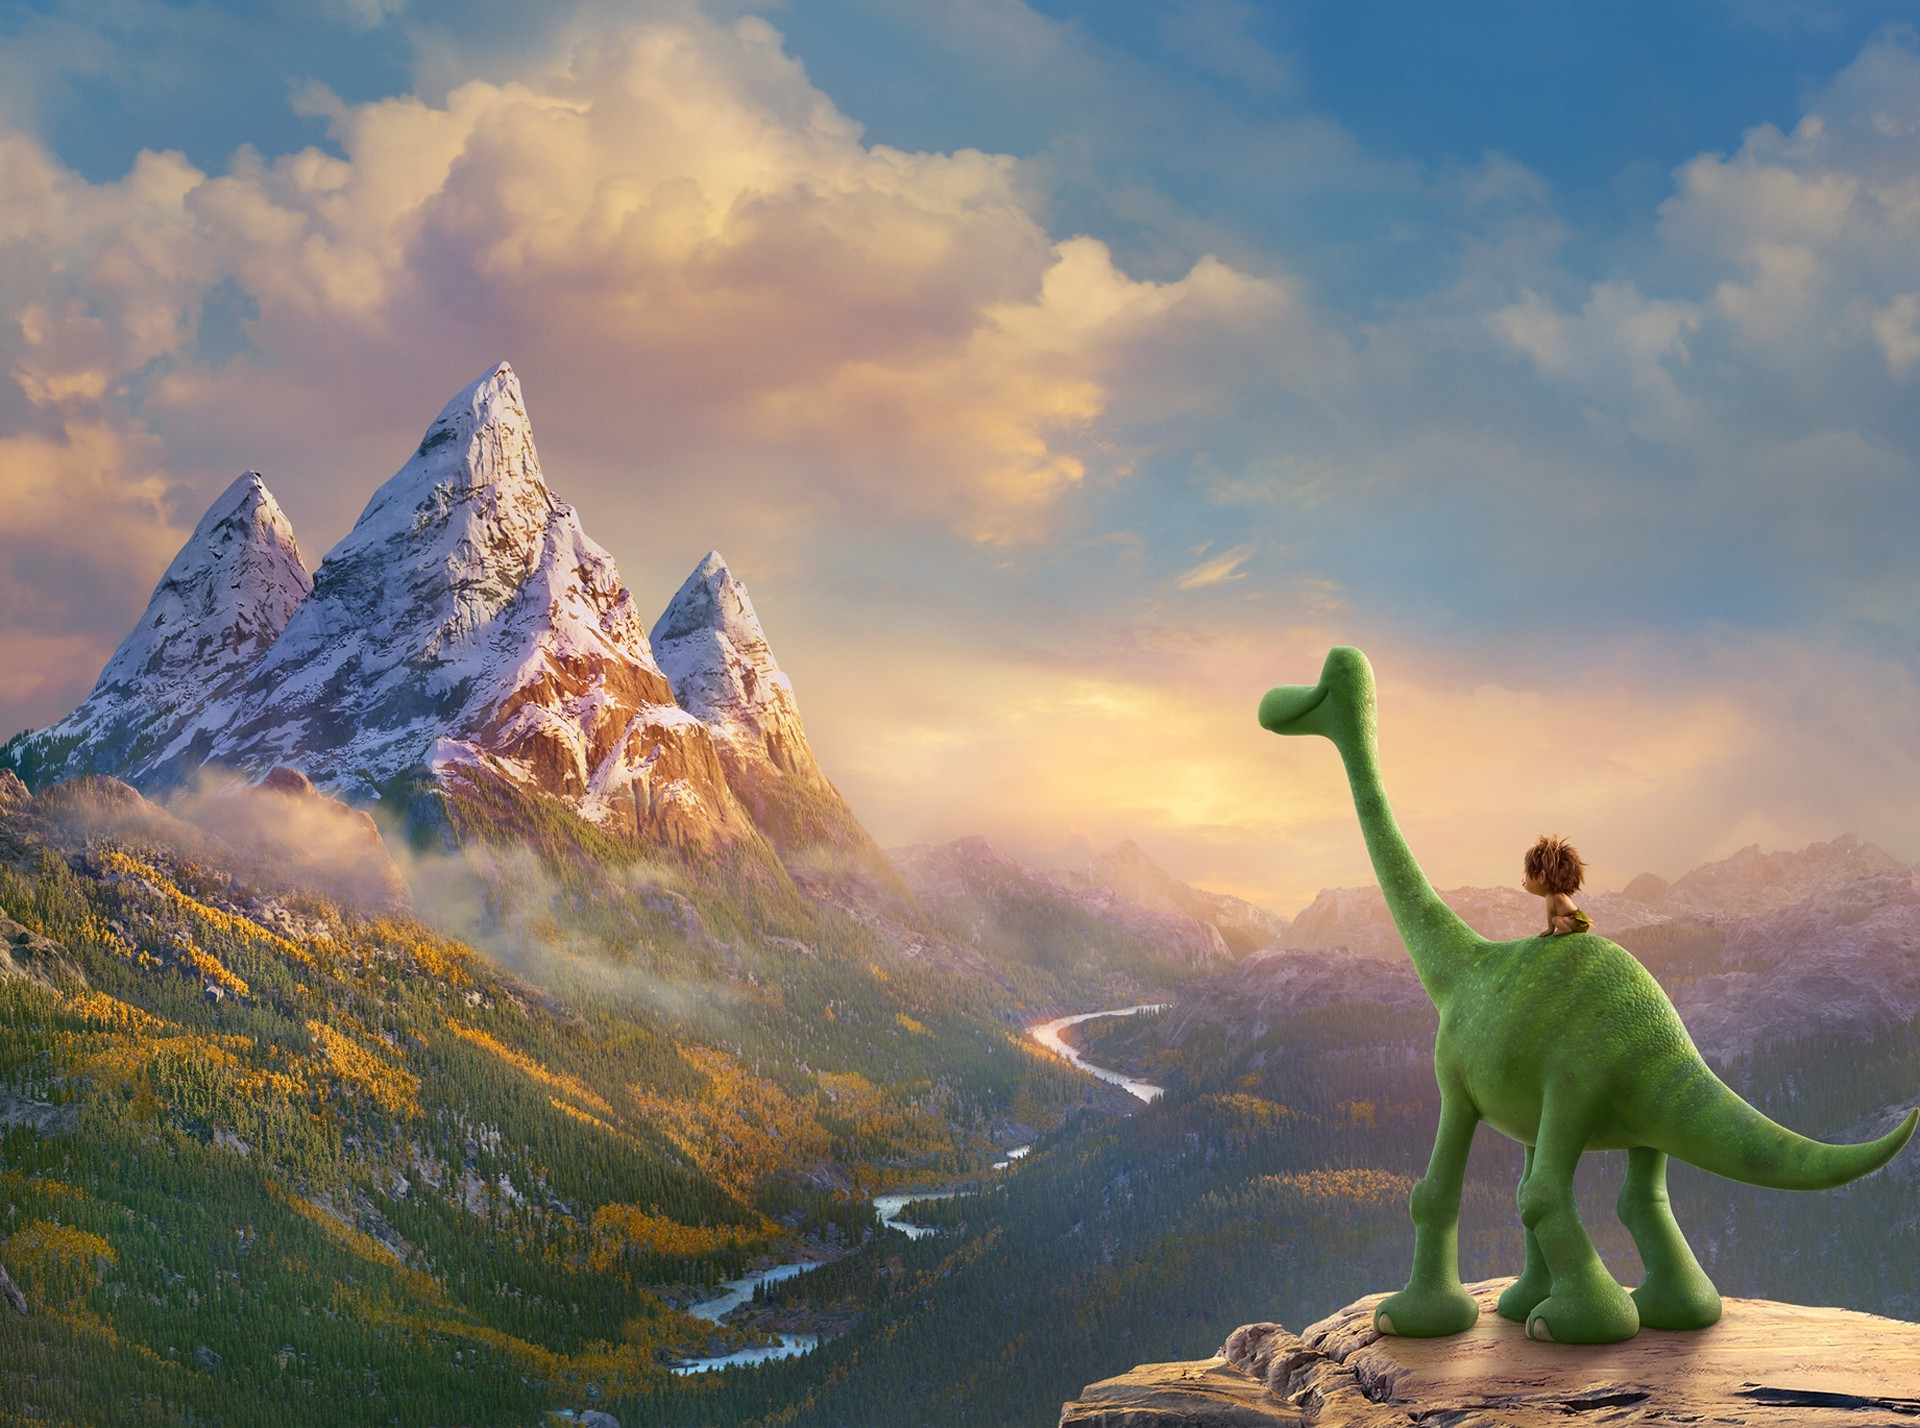 The Good Dinosaur Wallpaper HD (68+ Images